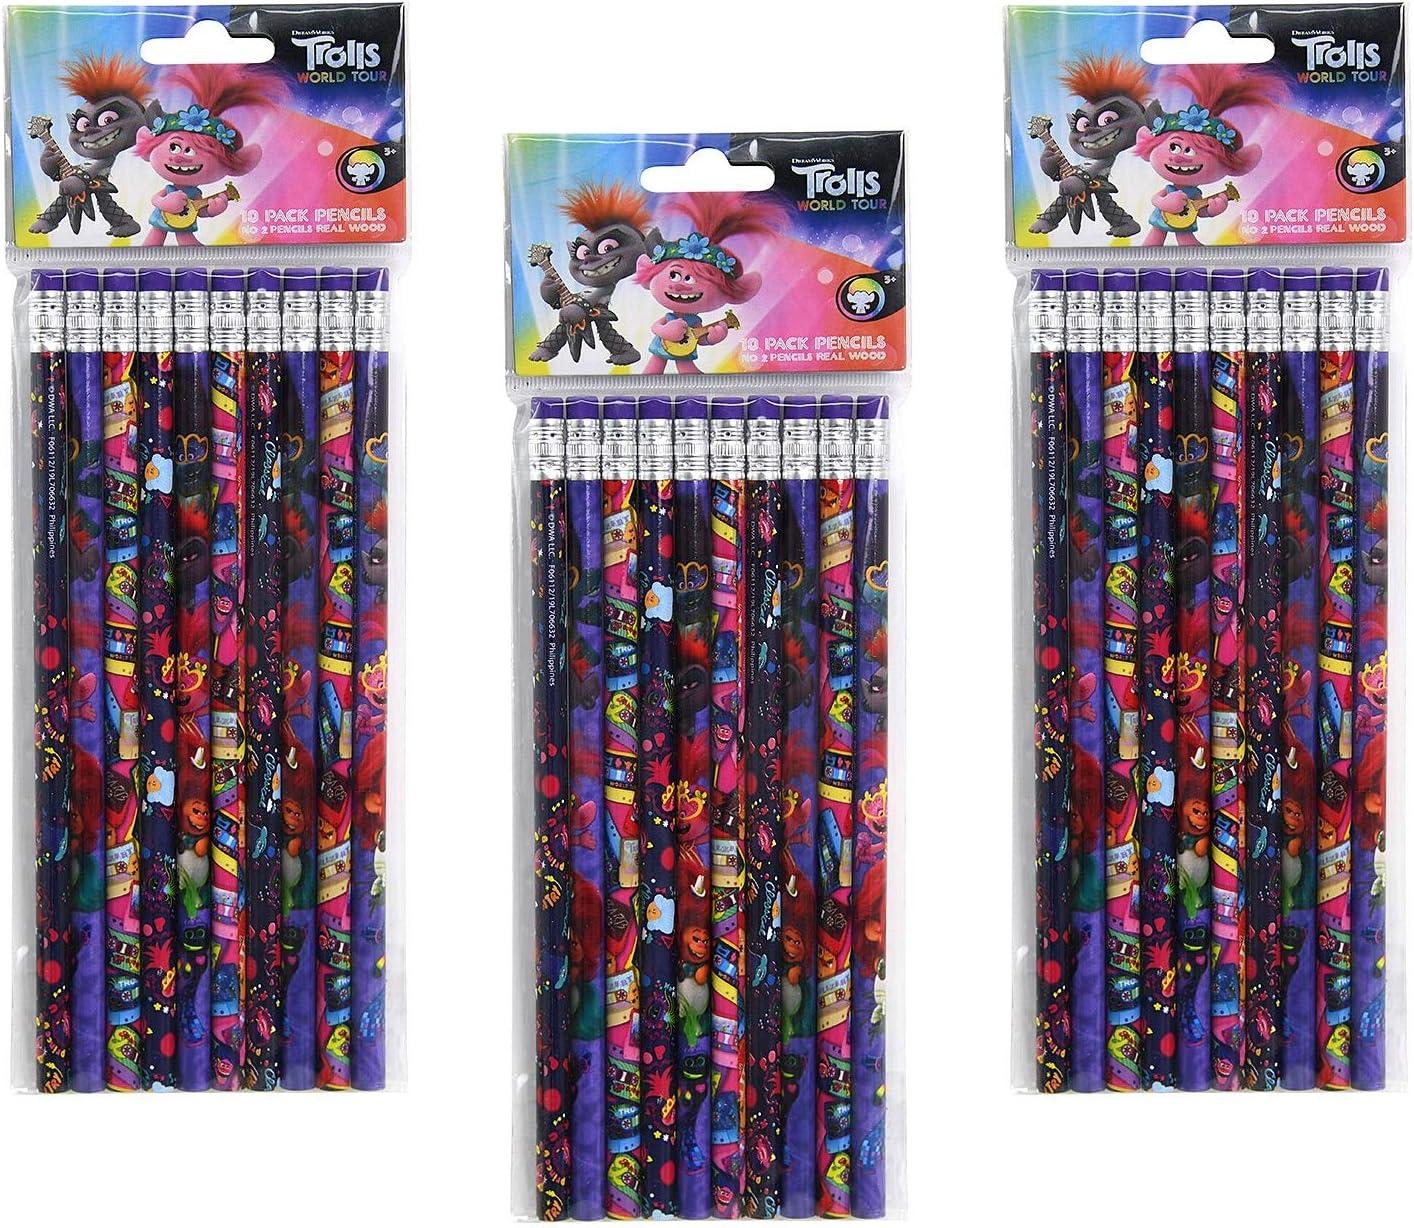 30 Total 3-Pack Trolls World Tour 10ct #2 Wood Pencils